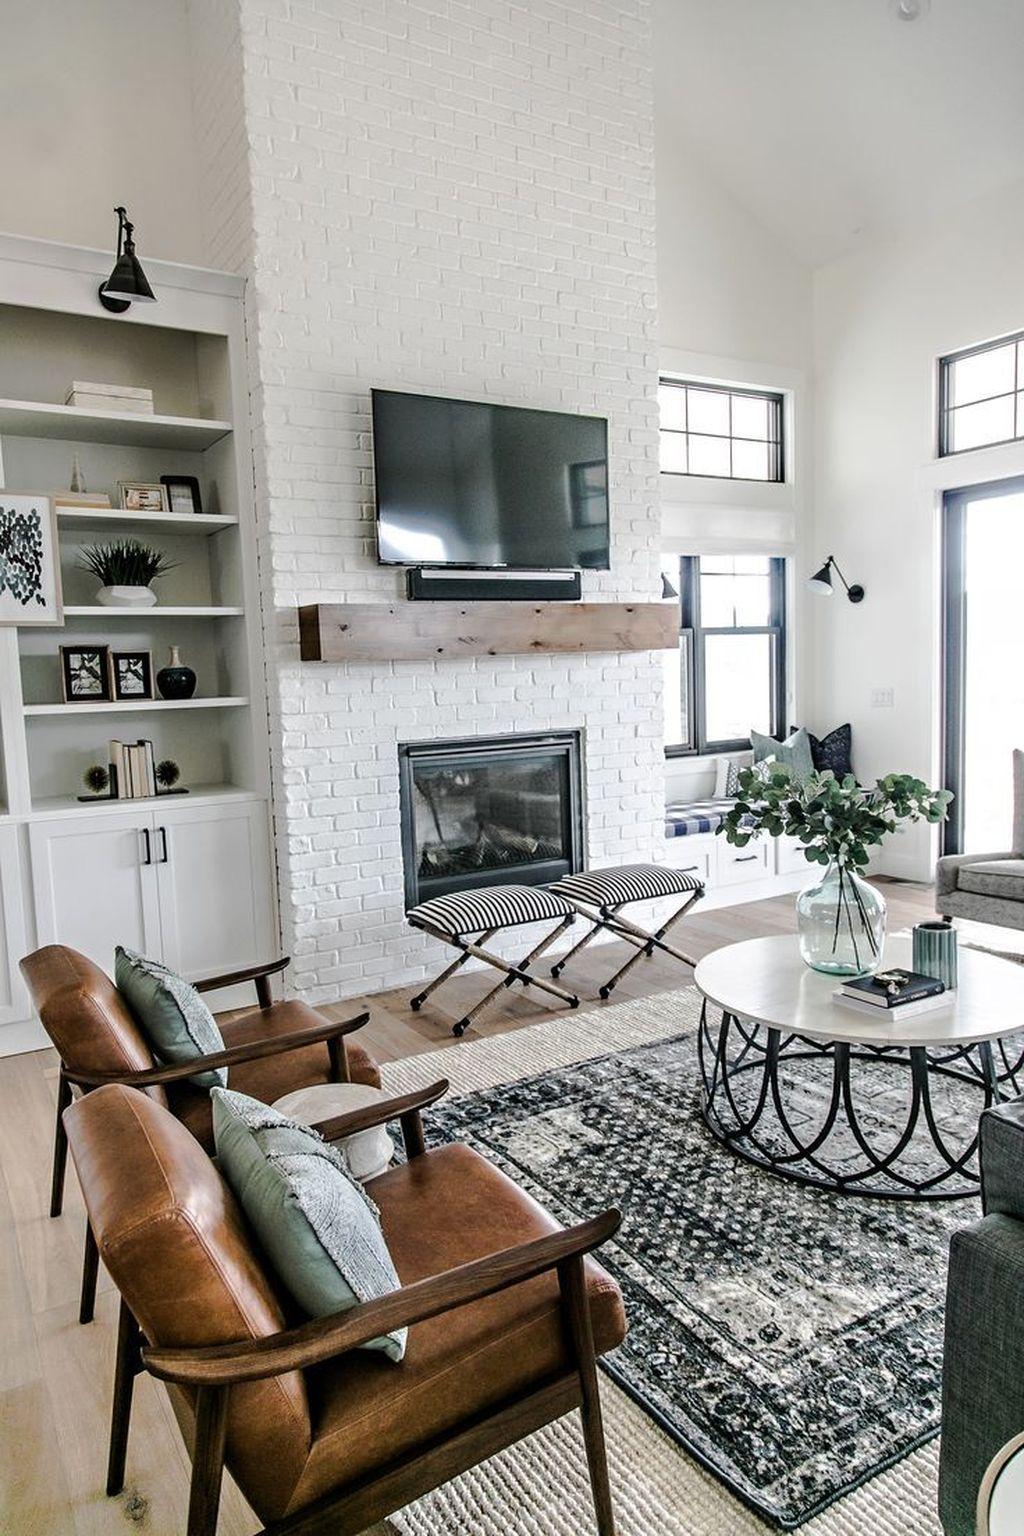 Excellent Furniture Design Ideas For Your Living Room 27